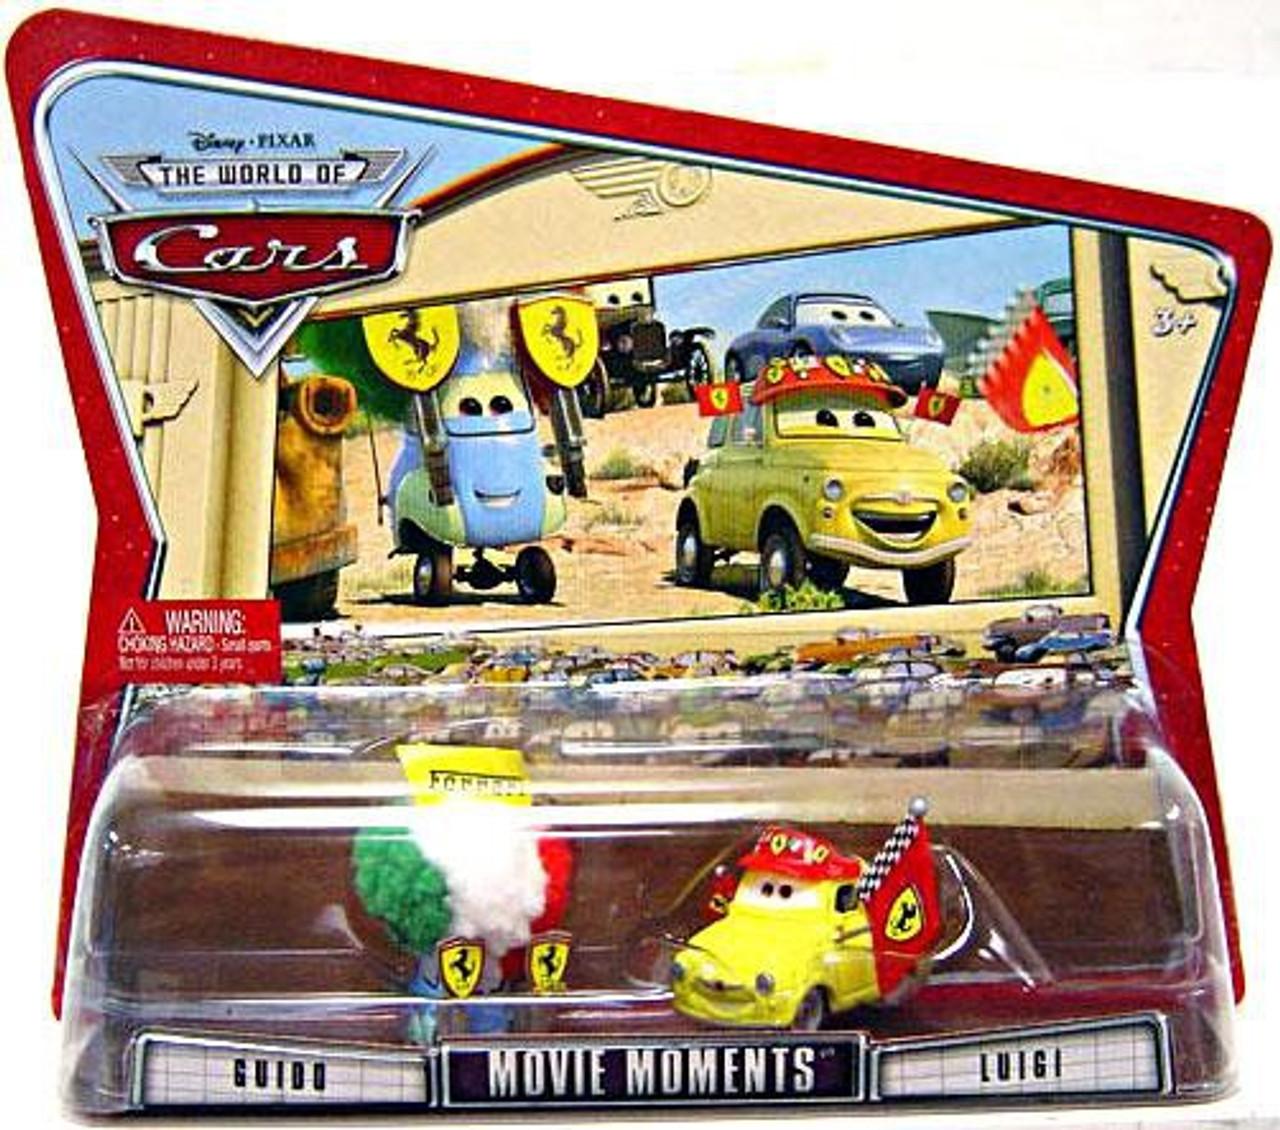 Disney Cars The World of Cars Movie Moments Guido & Luigi Diecast Car 2-Pack [Ferrari Gear]